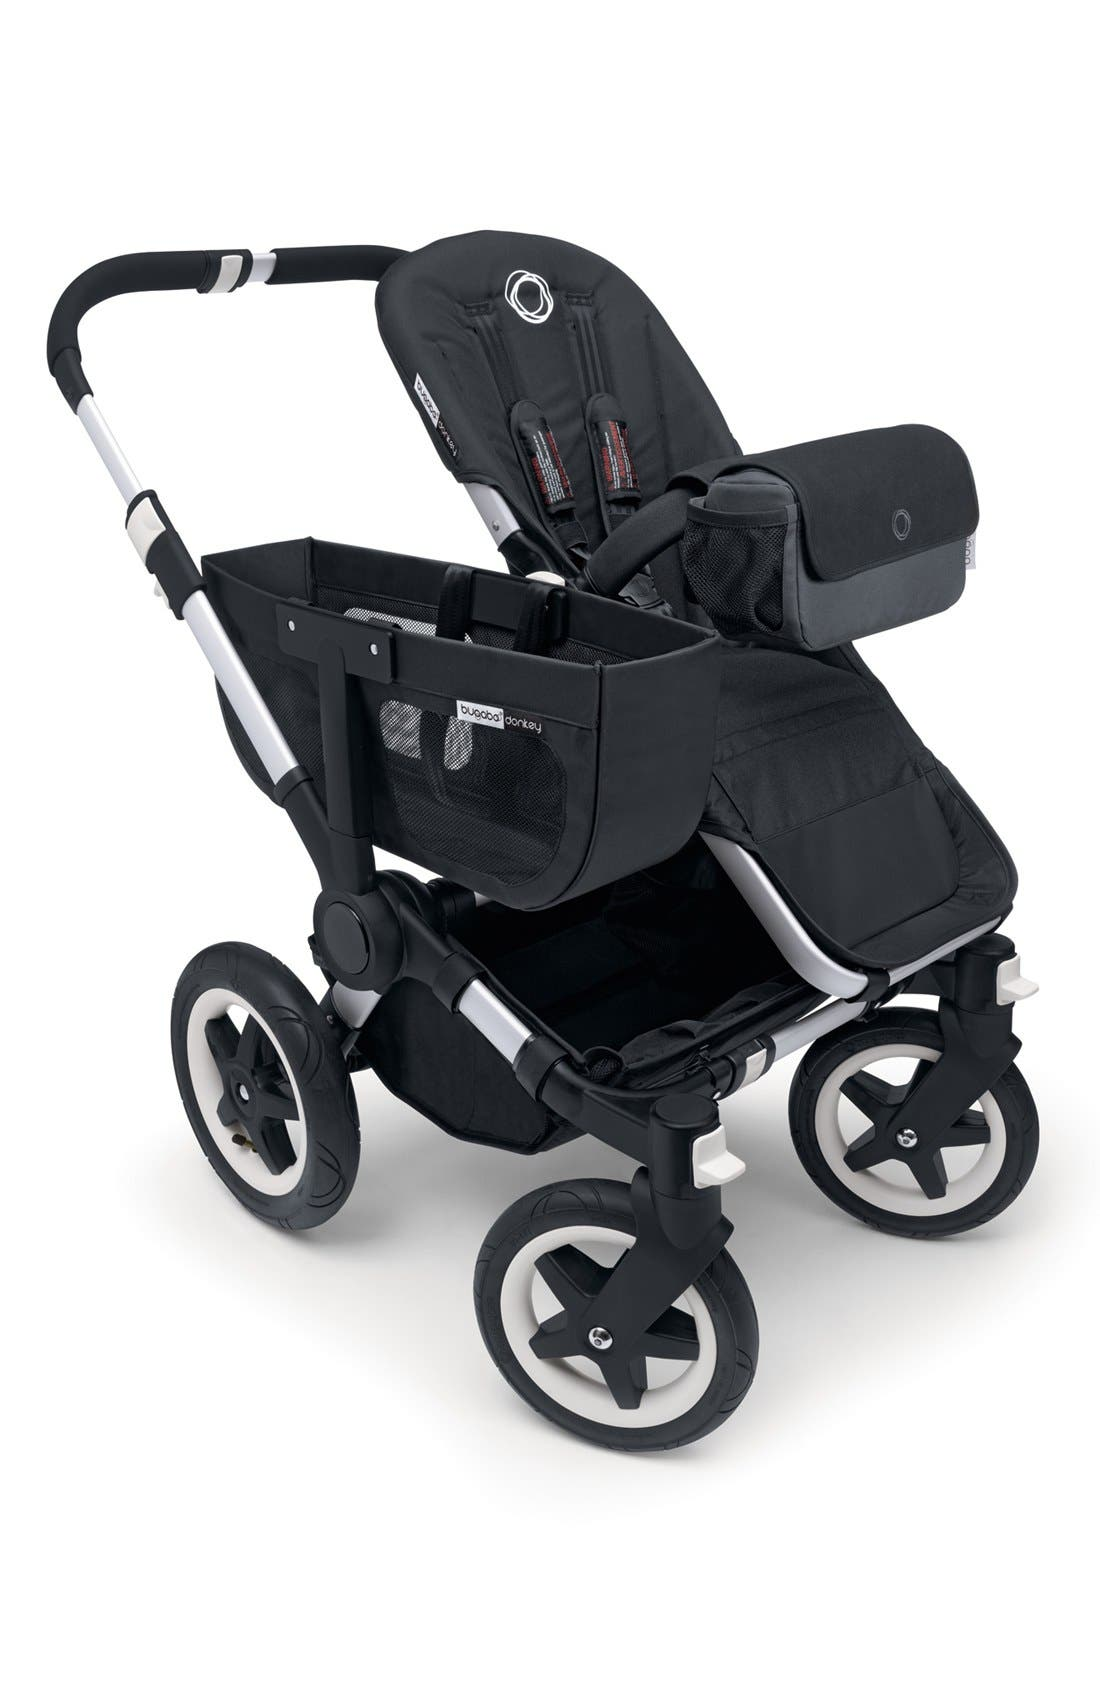 Main Image - Bugaboo 'Donkey' Stroller - Aluminum Frame